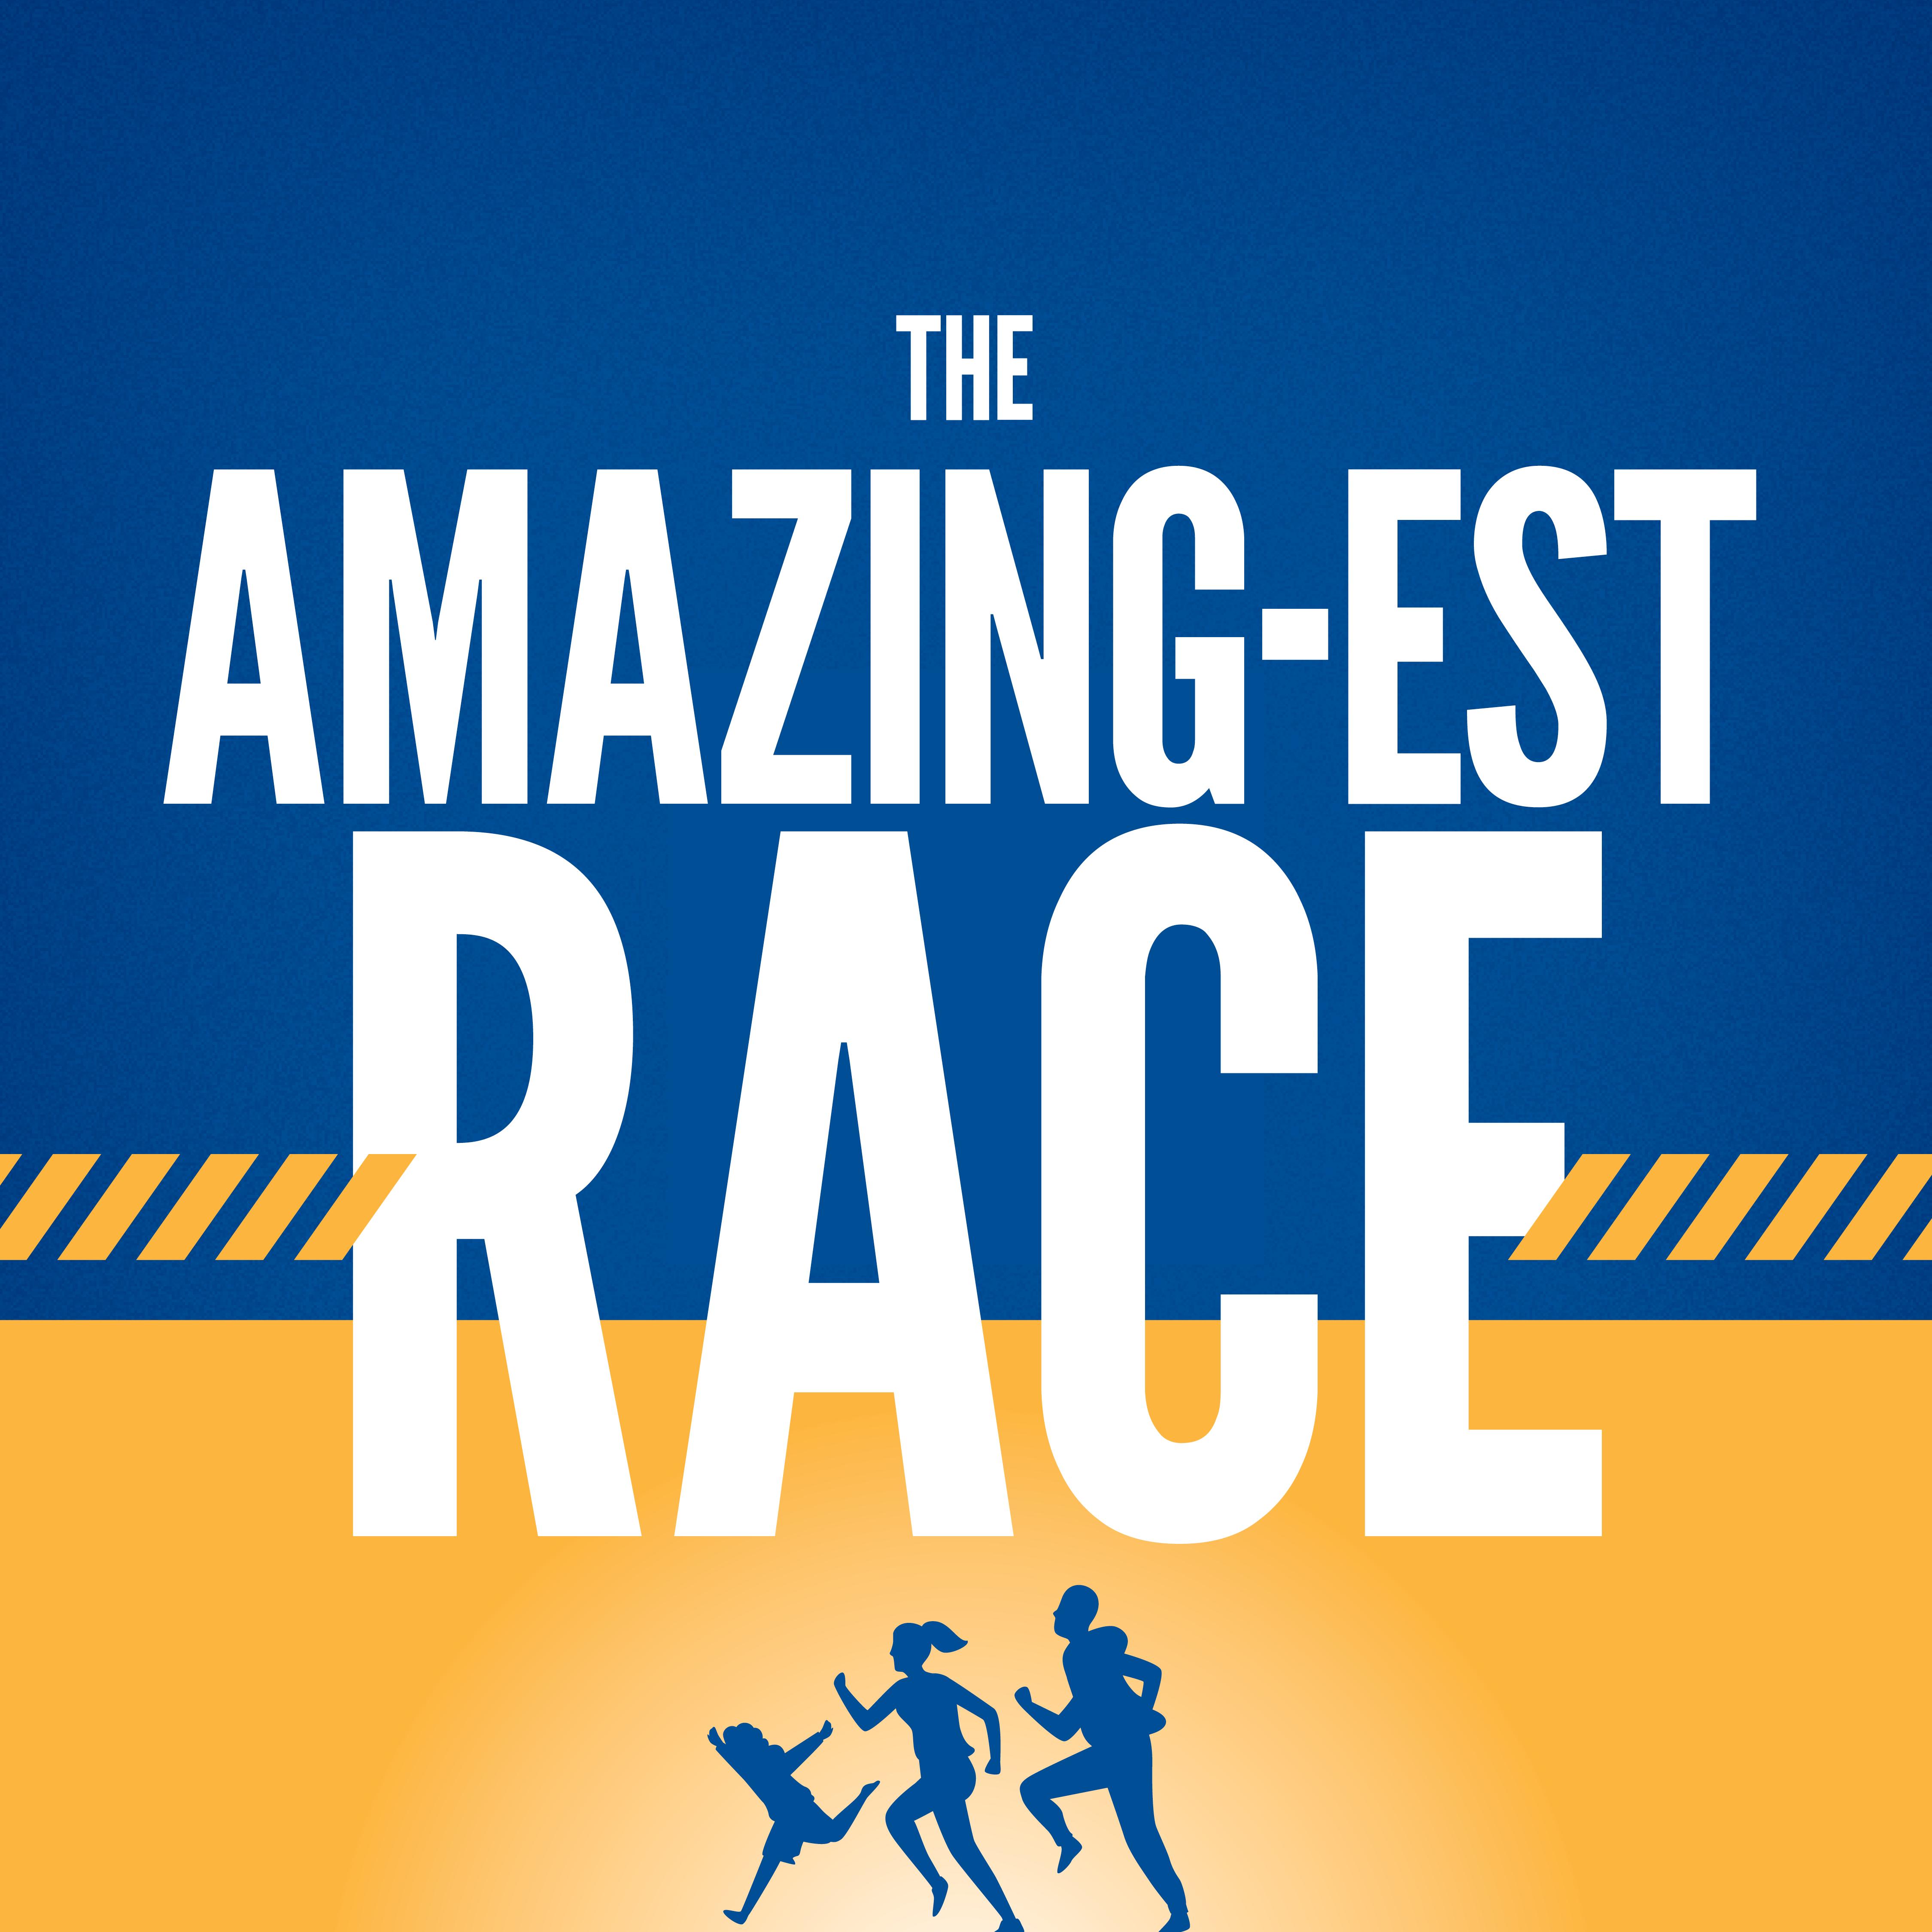 United Way's Amazing-est Race